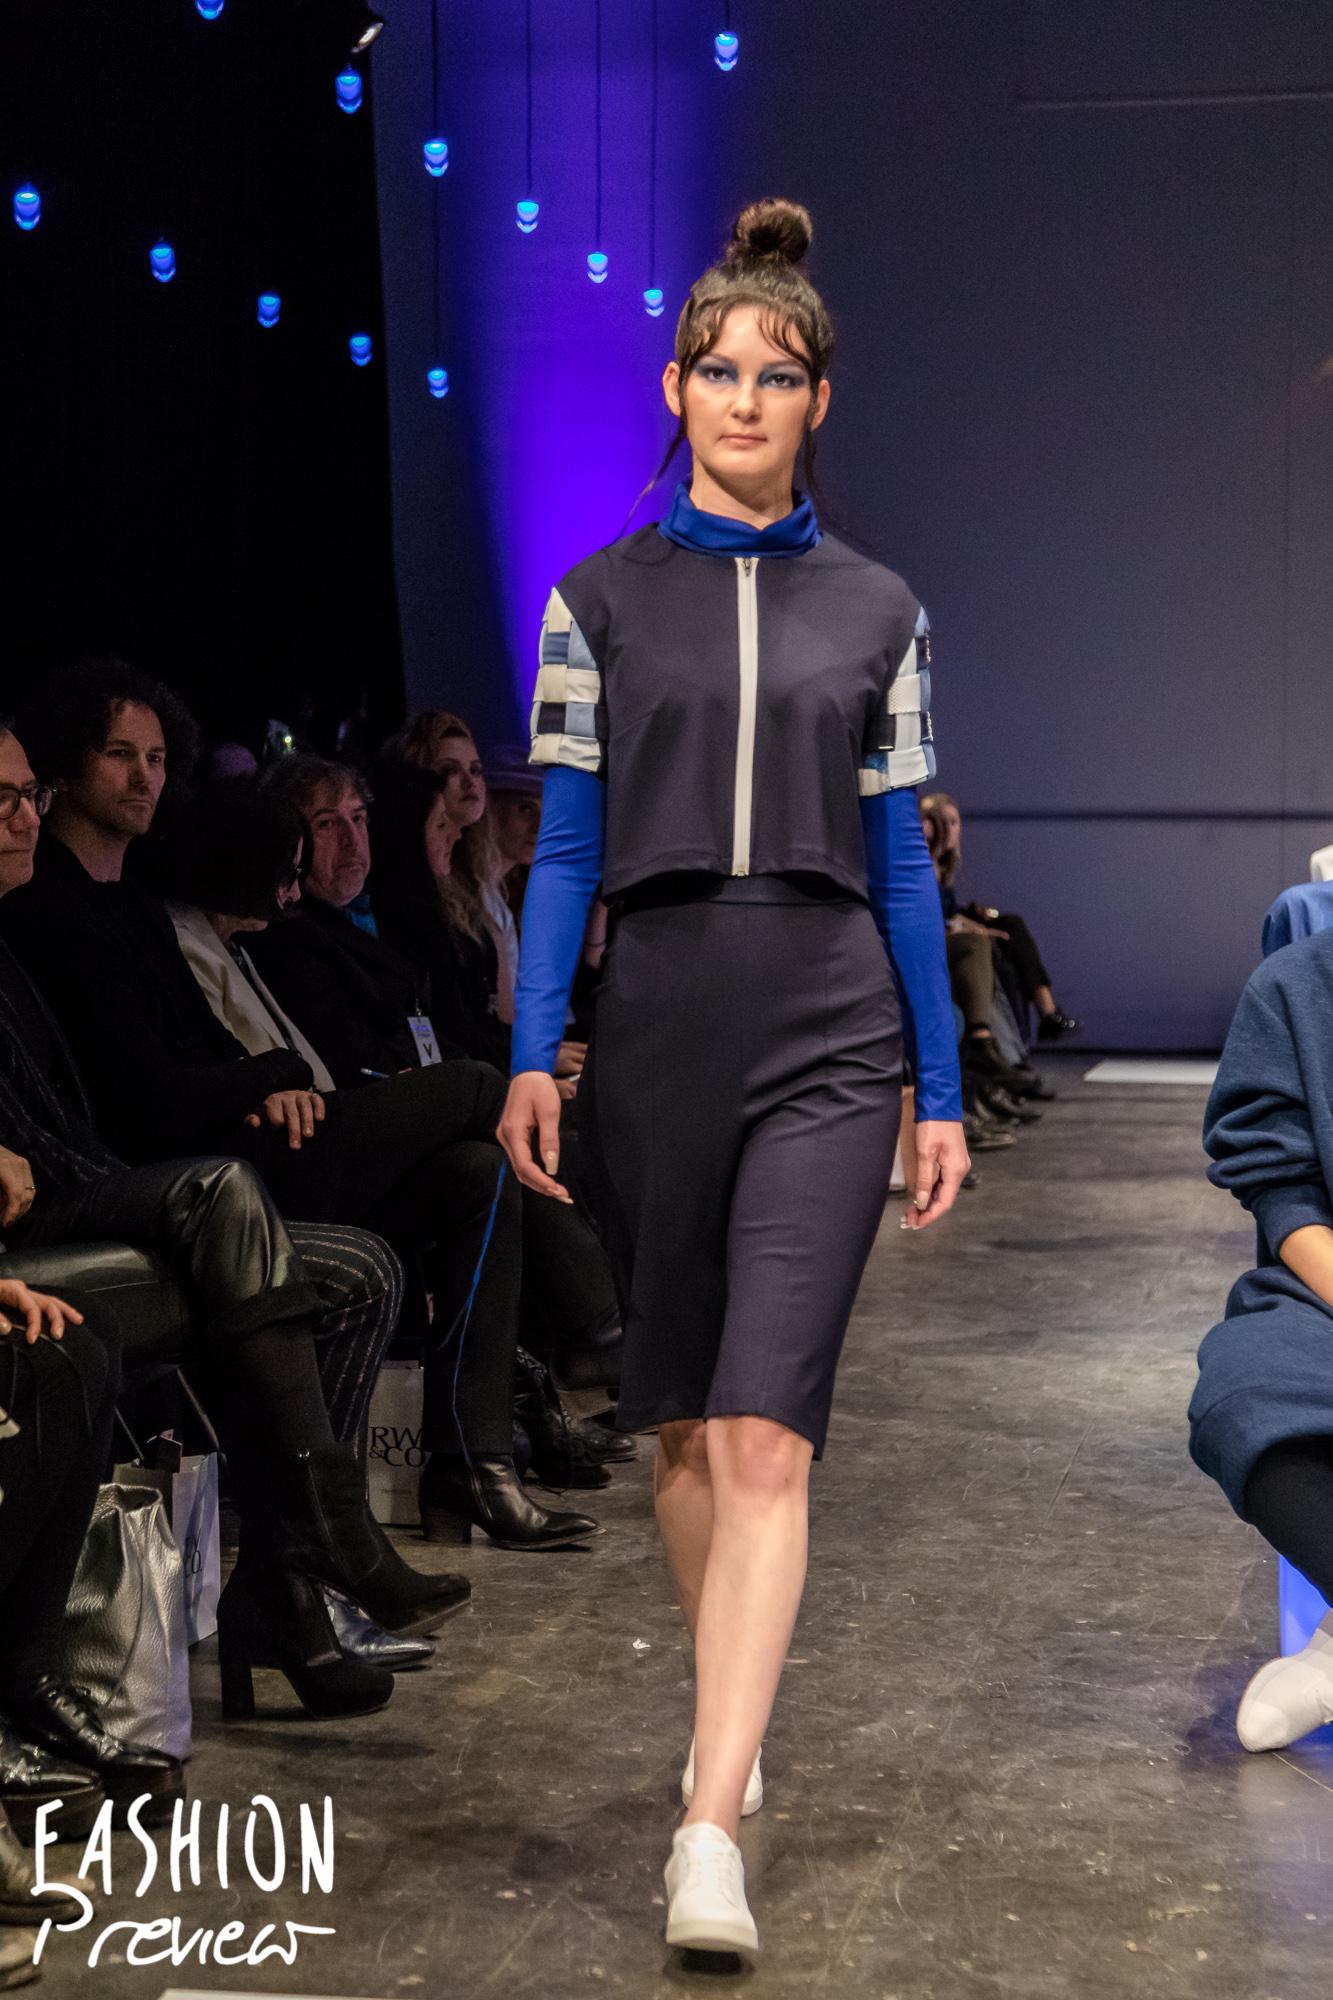 Fashion Preview 9 - Cegep Marie Victorin-14.jpg